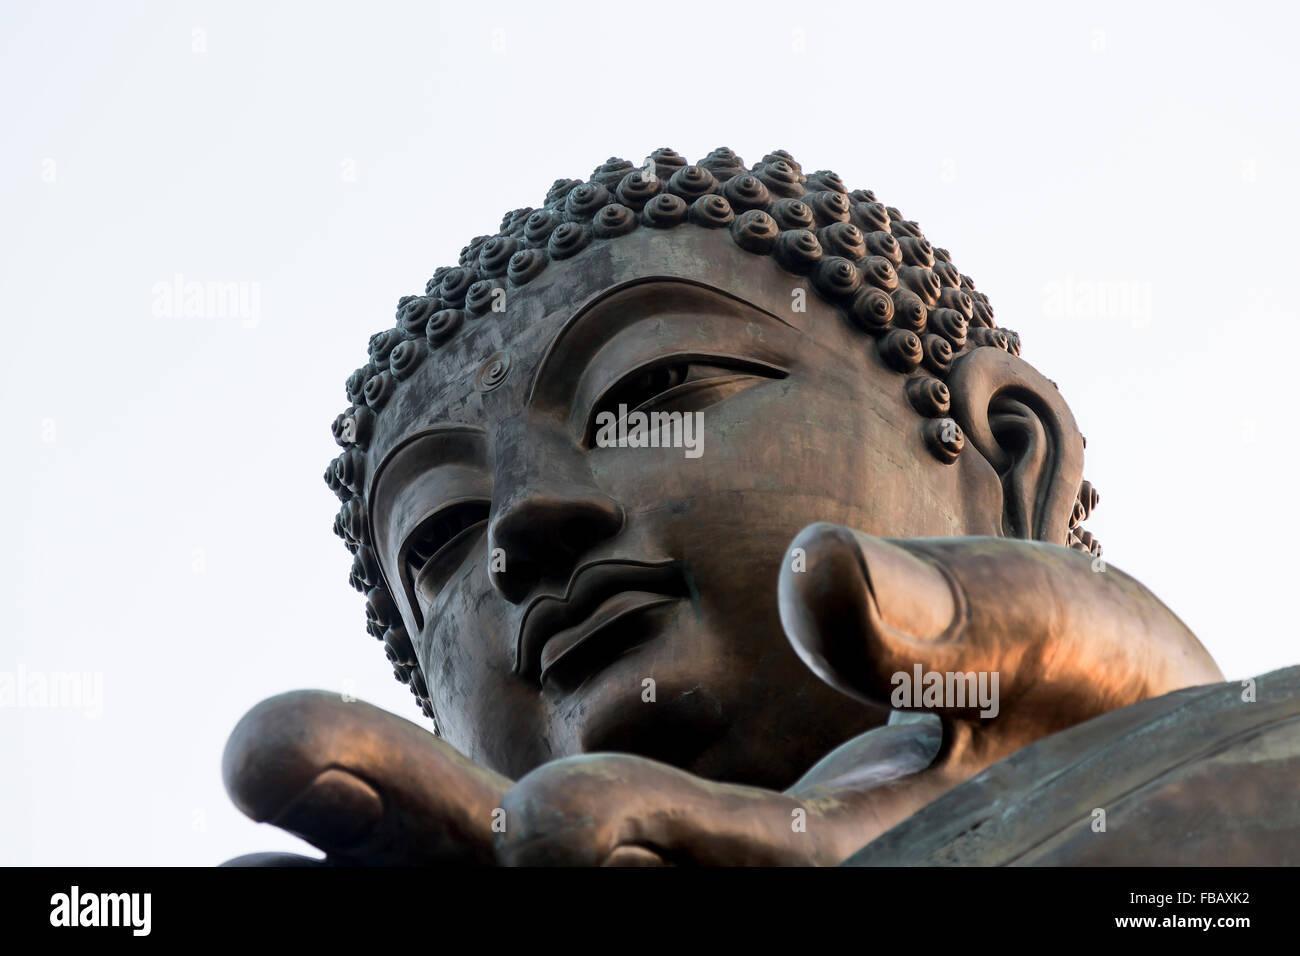 Giant Buddha, Lantau Island - Hong Kong Stock Photo